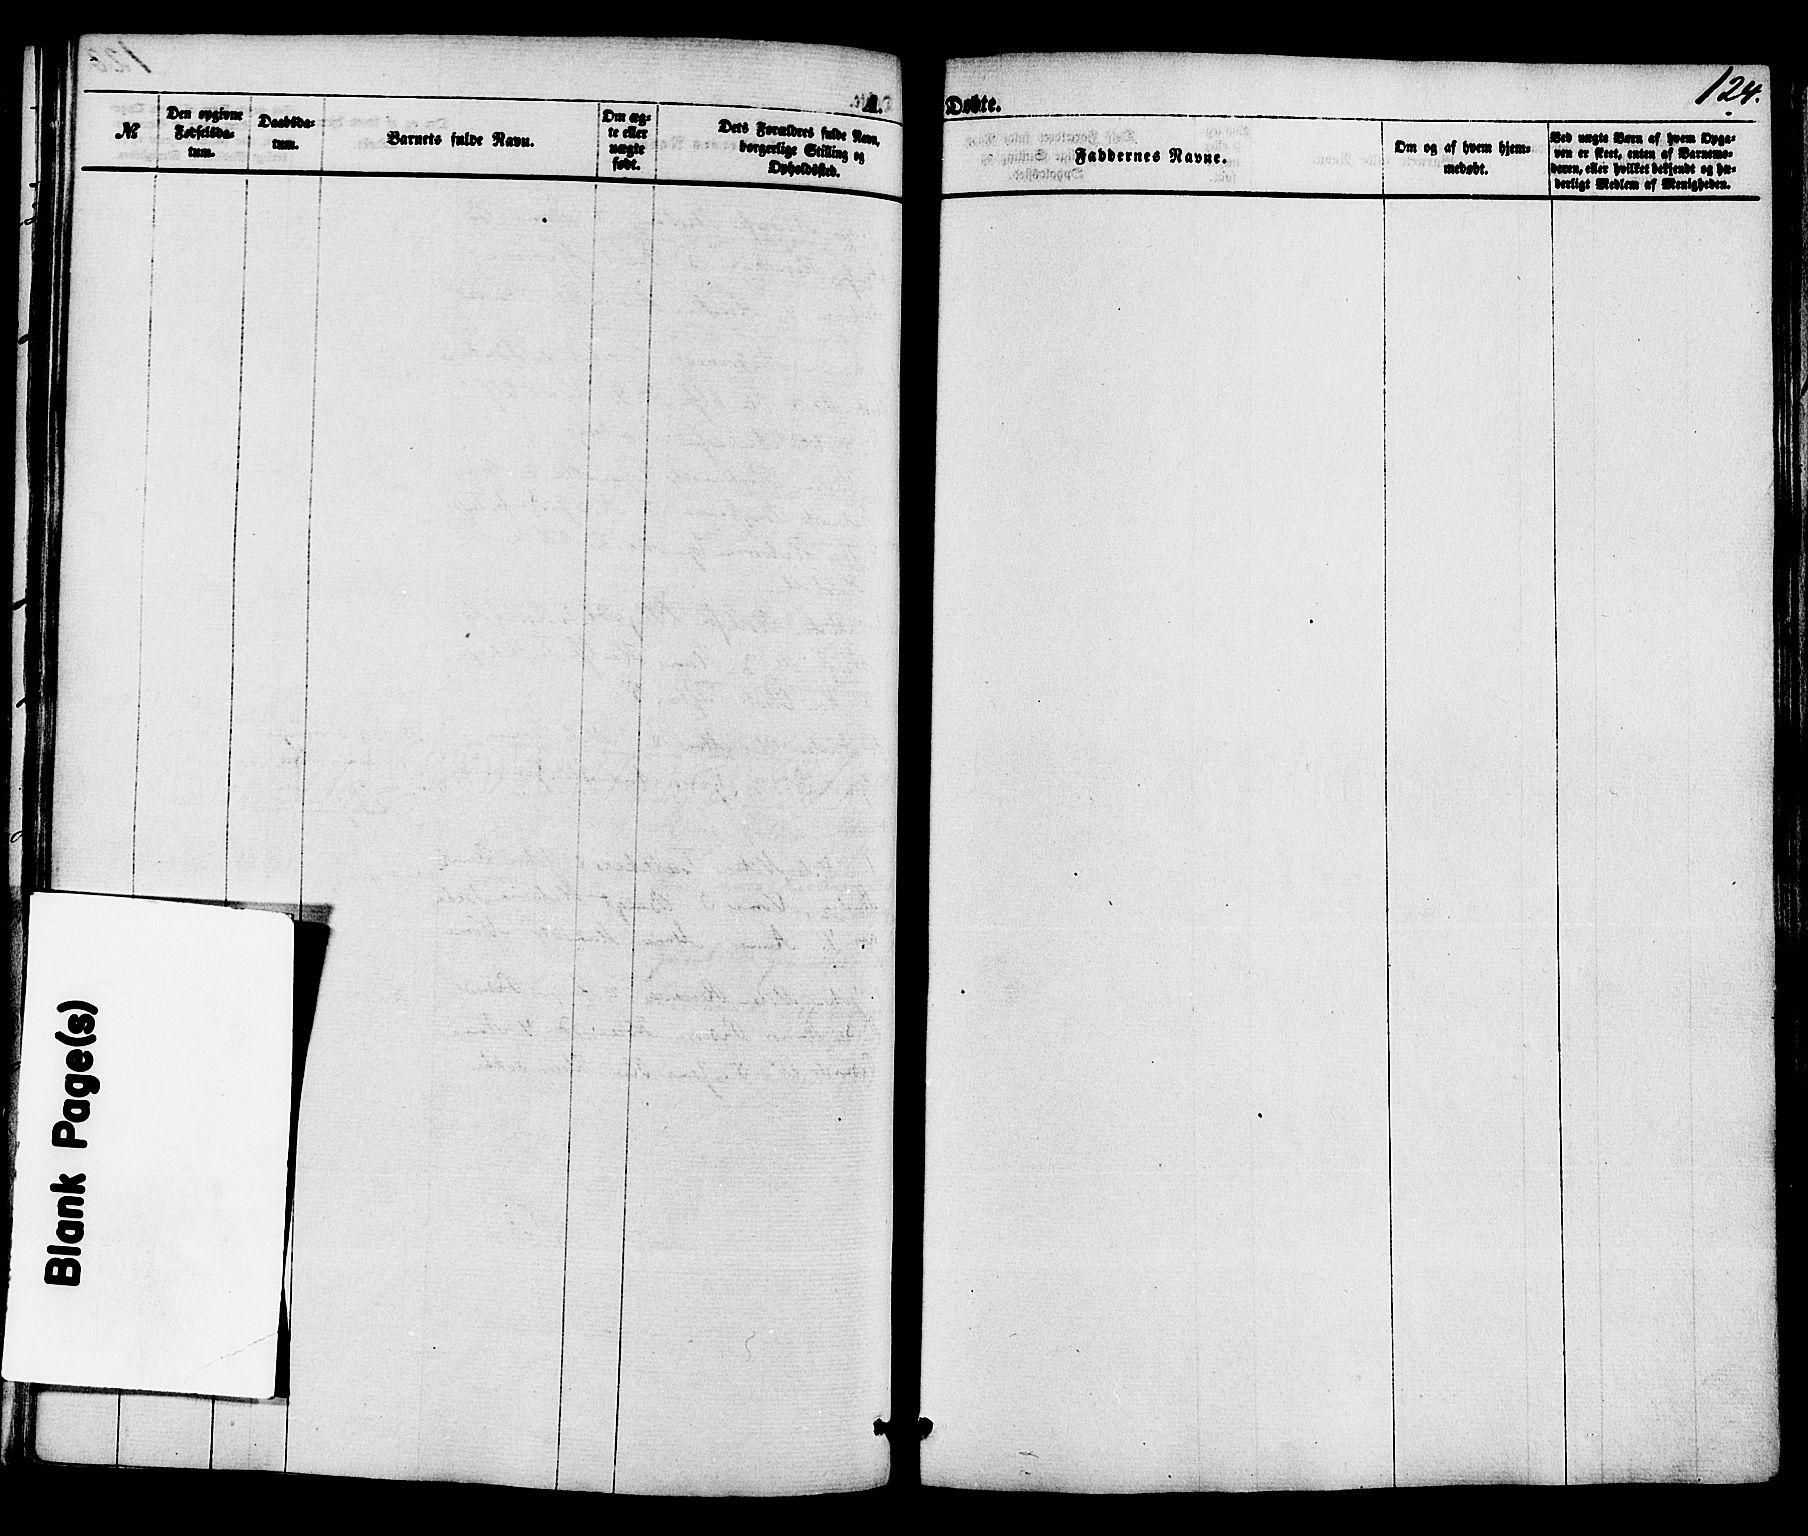 SAKO, Holla kirkebøker, F/Fa/L0007: Ministerialbok nr. 7, 1869-1881, s. 124